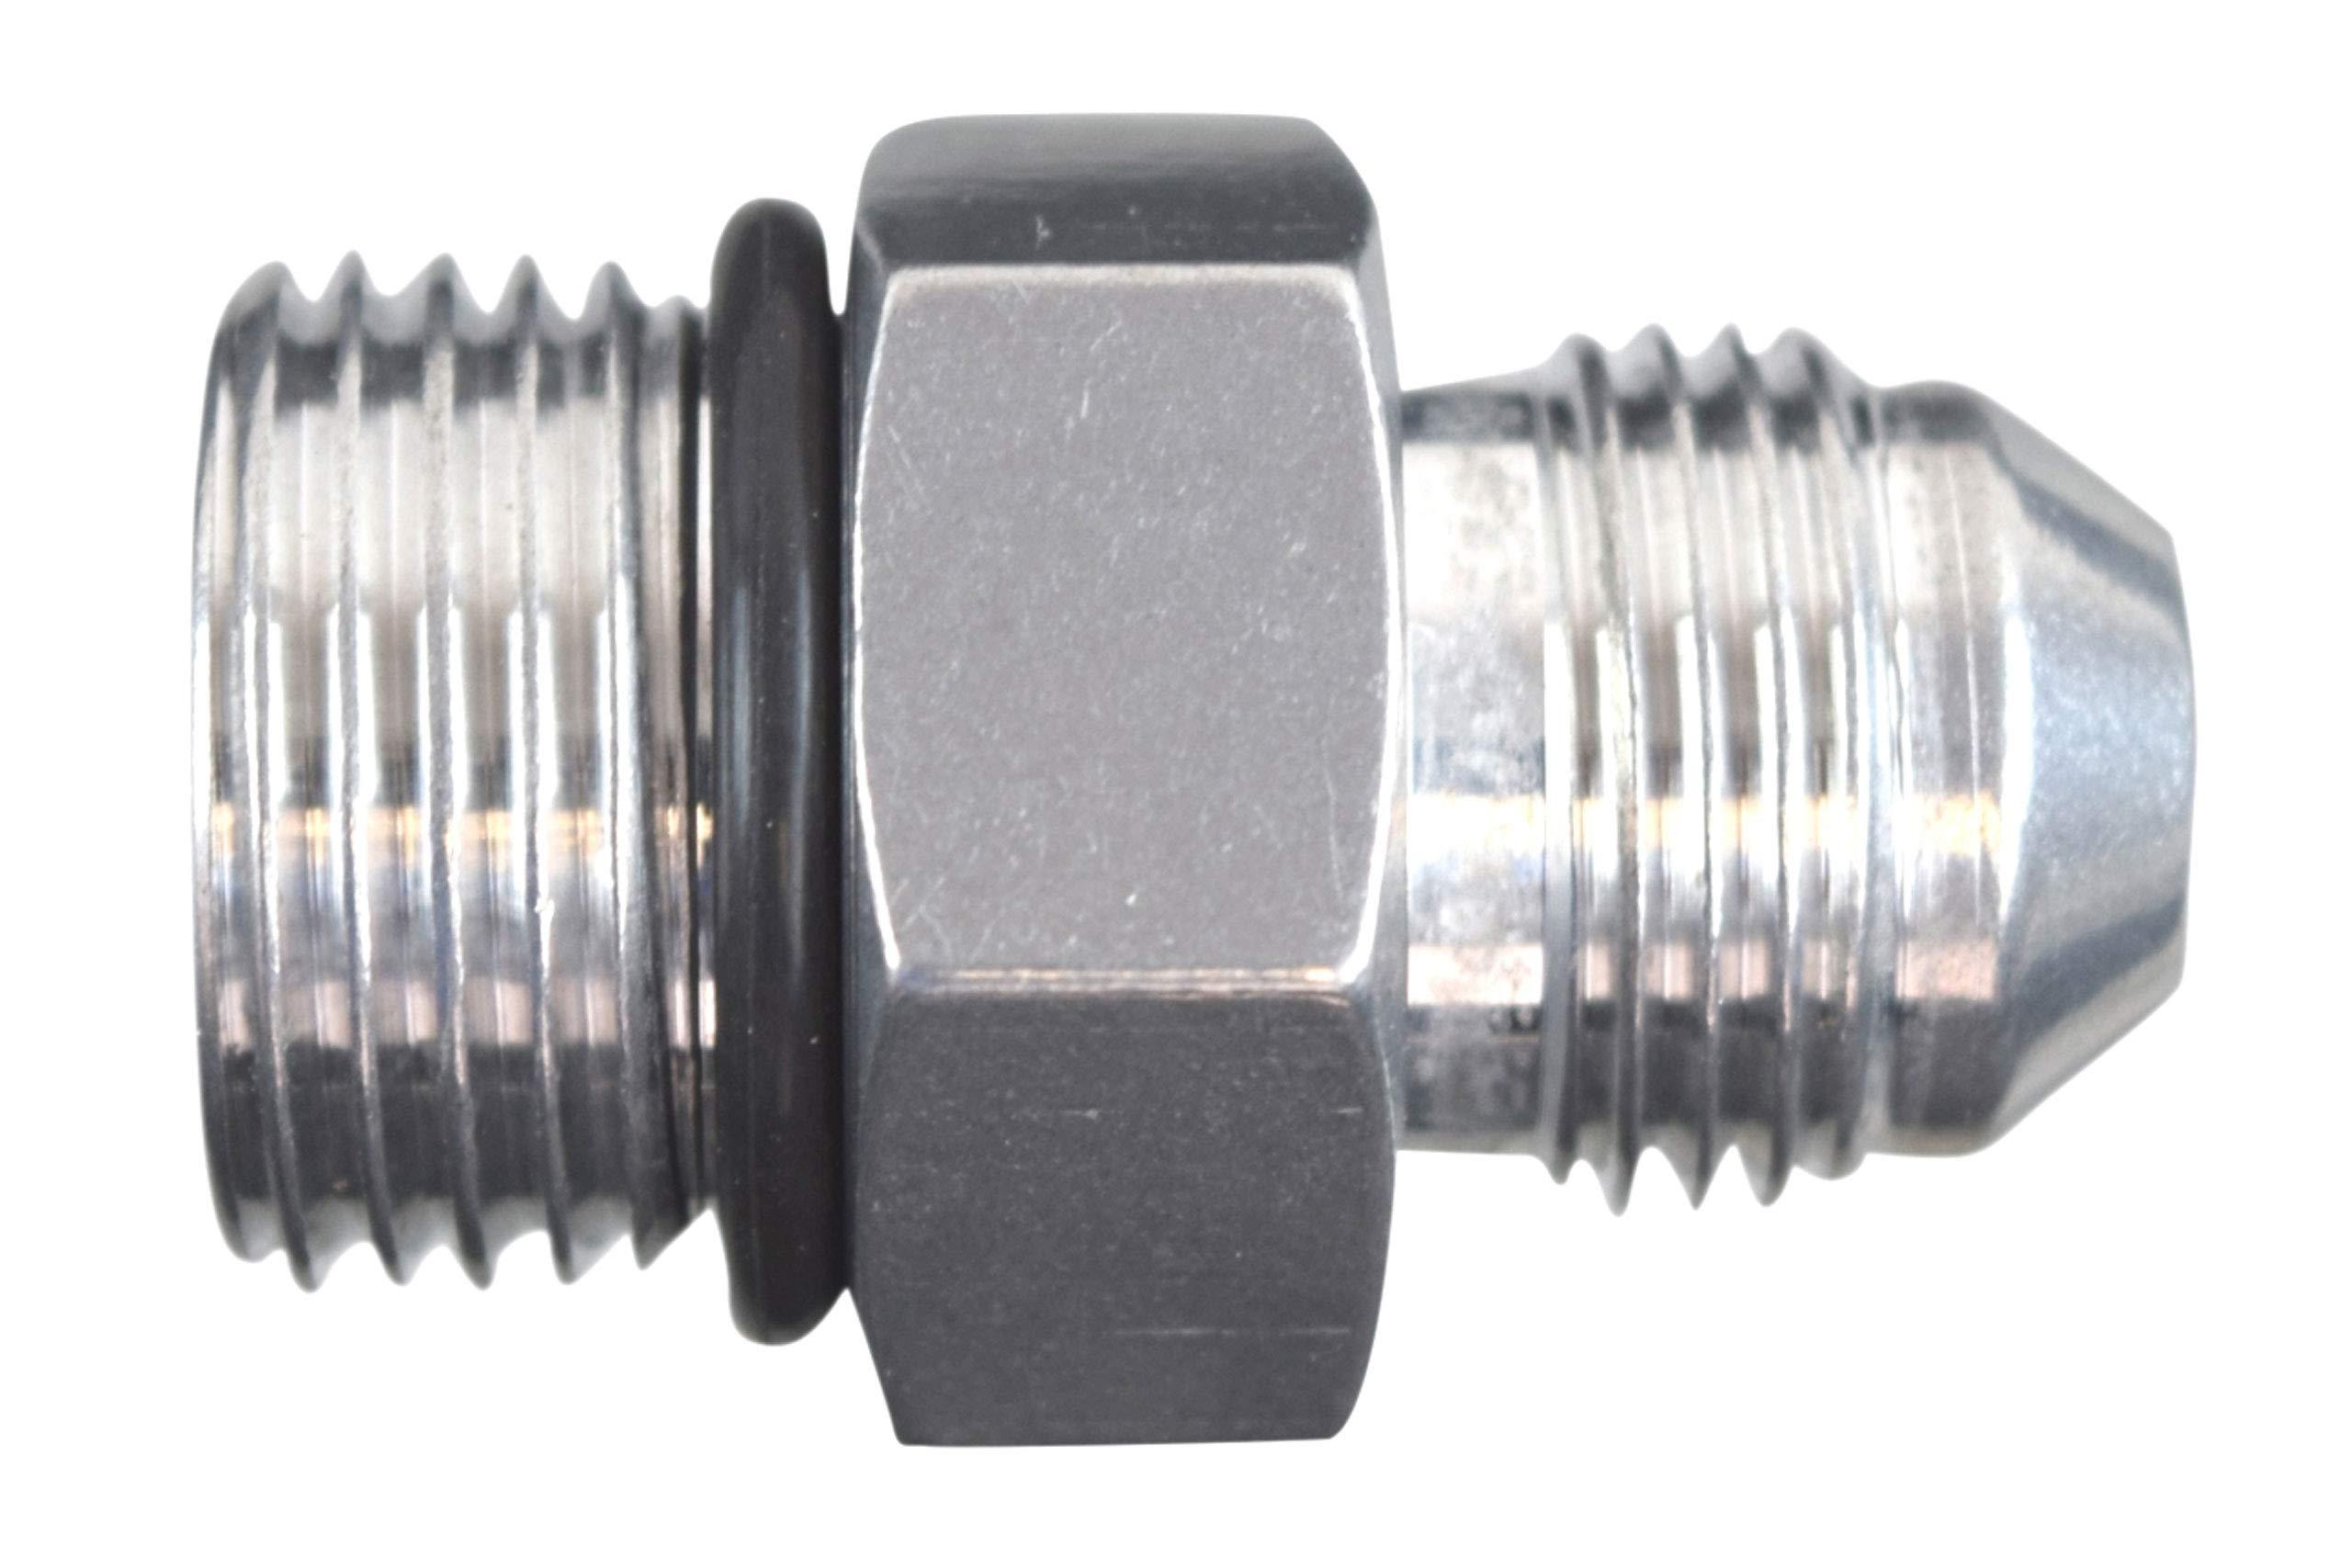 ICT Billet -8AN Flare to -10AN ORB Oring Male Fuel Pump Rail Adapter Fitting Flare Hose Plumbing Oil Straight Thread Regulator Port Fluid End Bare Aluminum AN920-08-10A